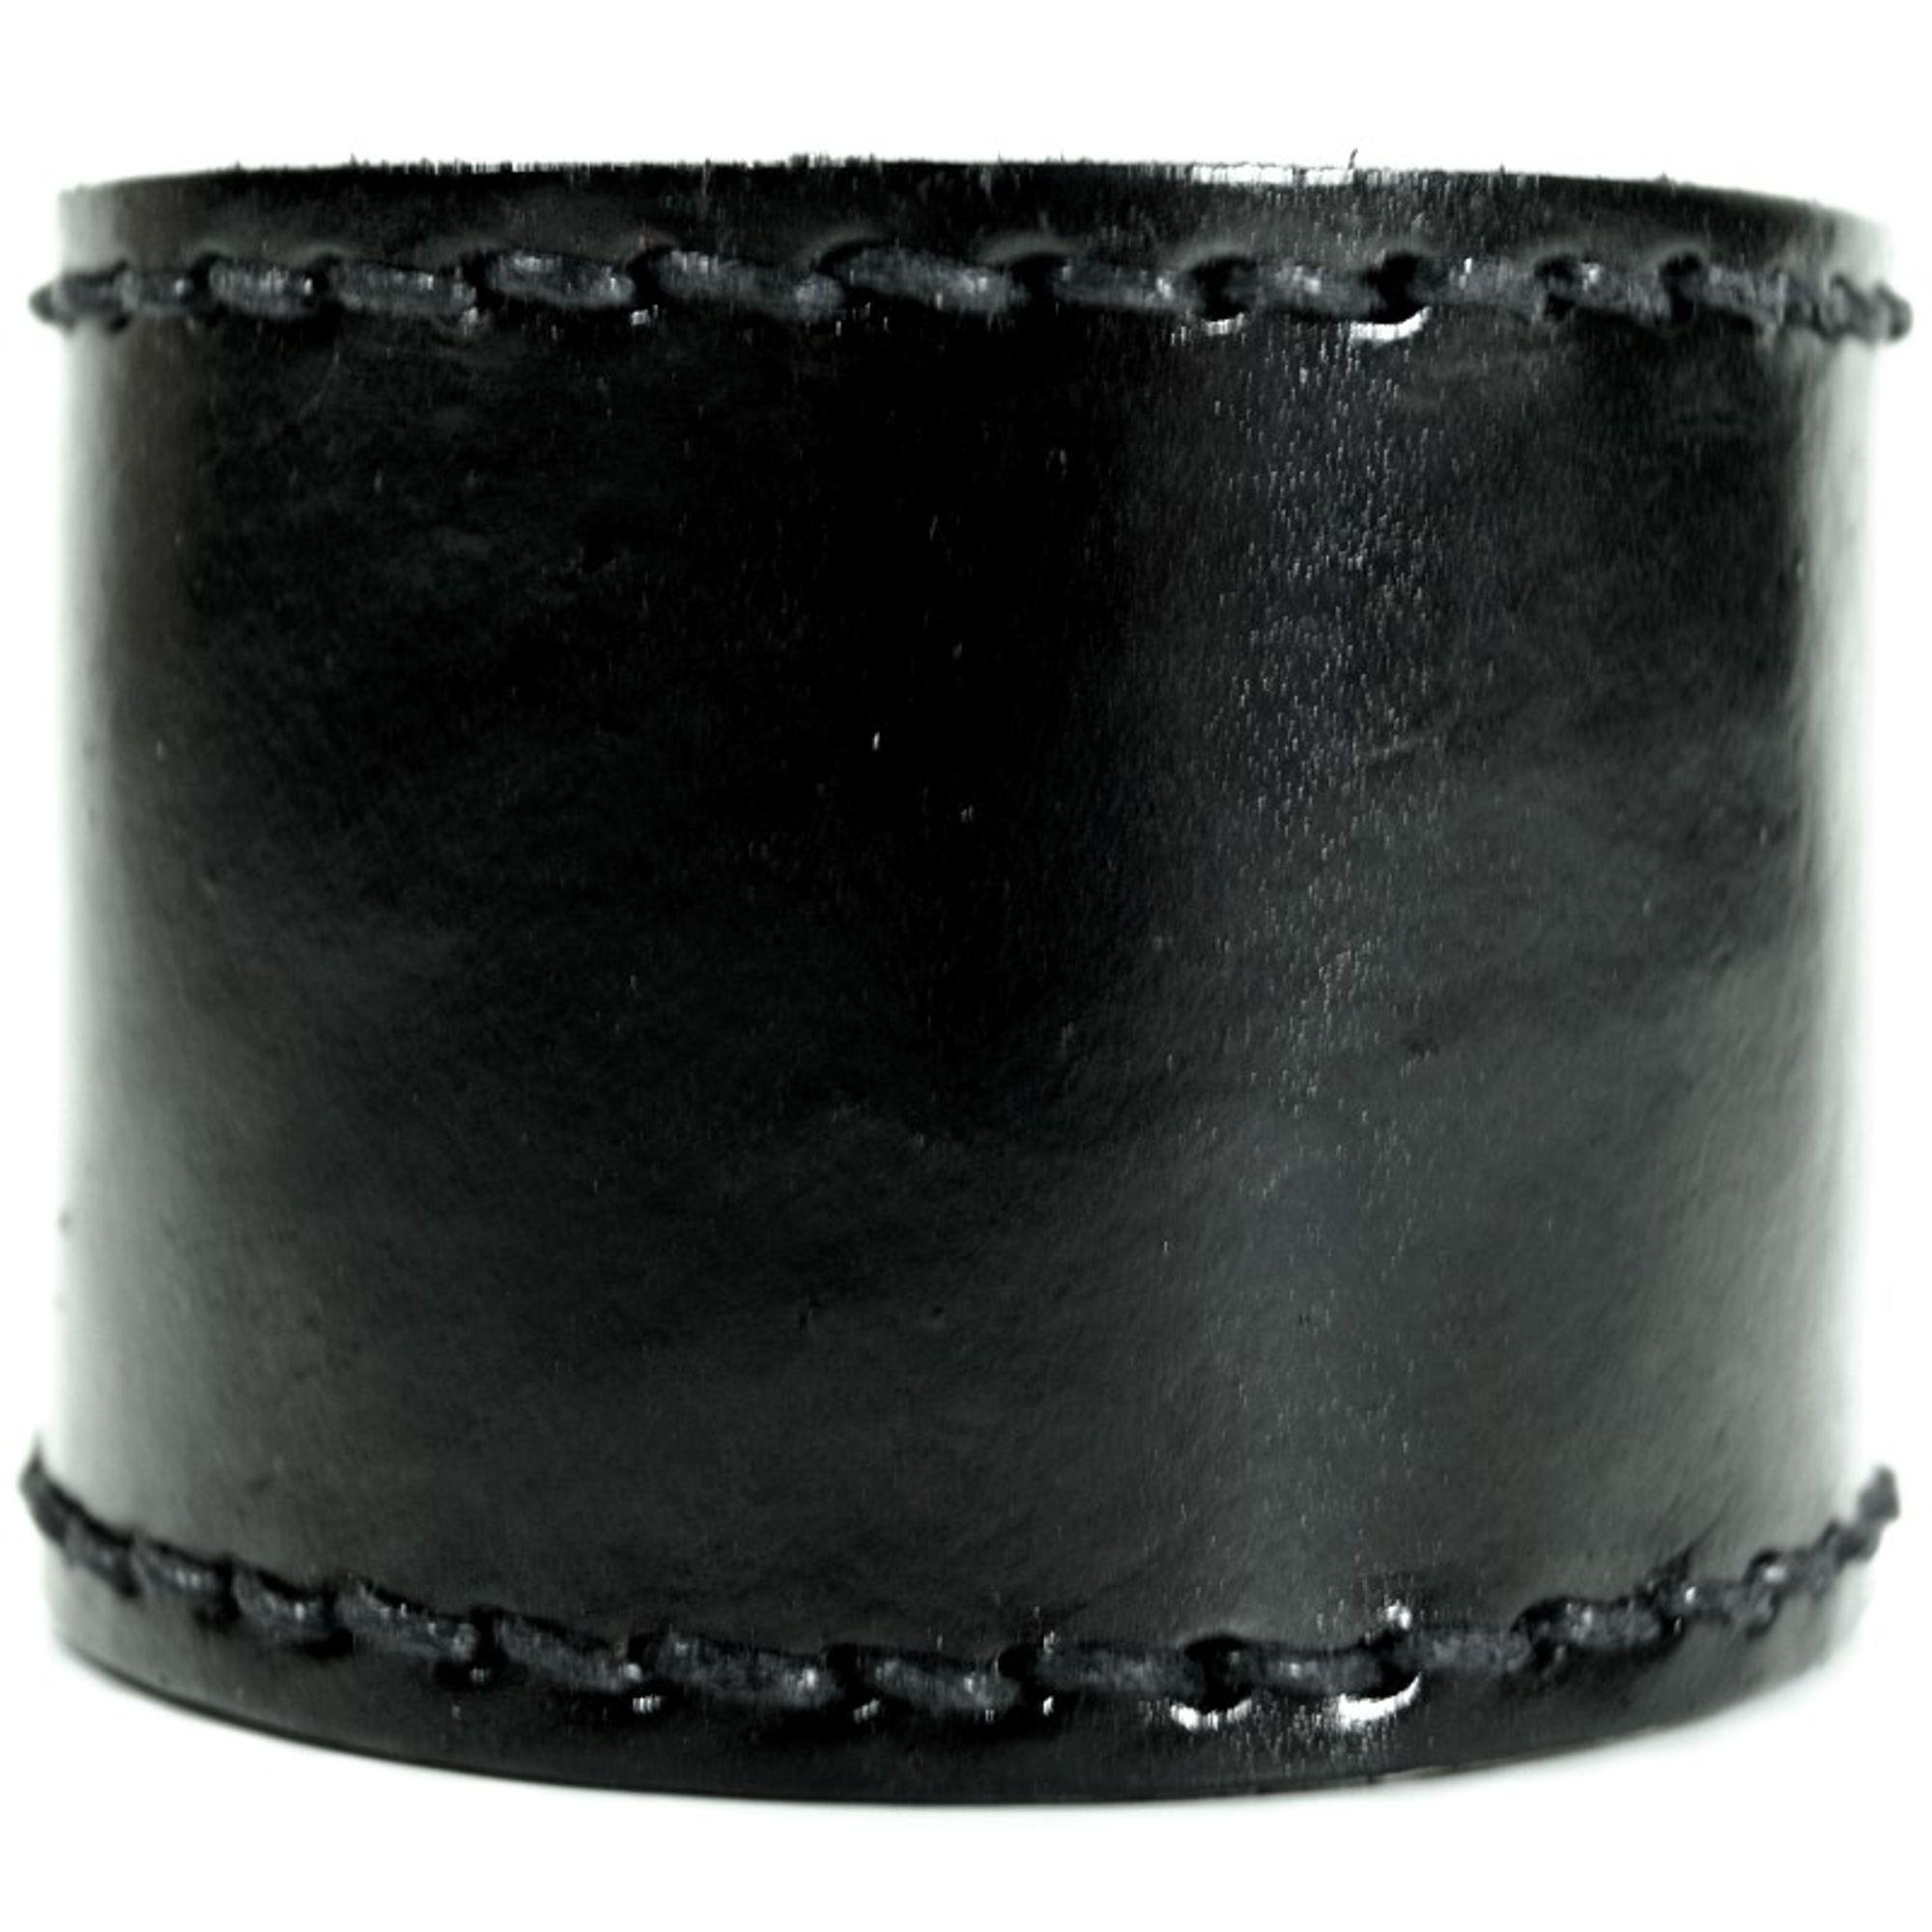 CJBB1943 Herren Armband Leder schwarz 22 cm